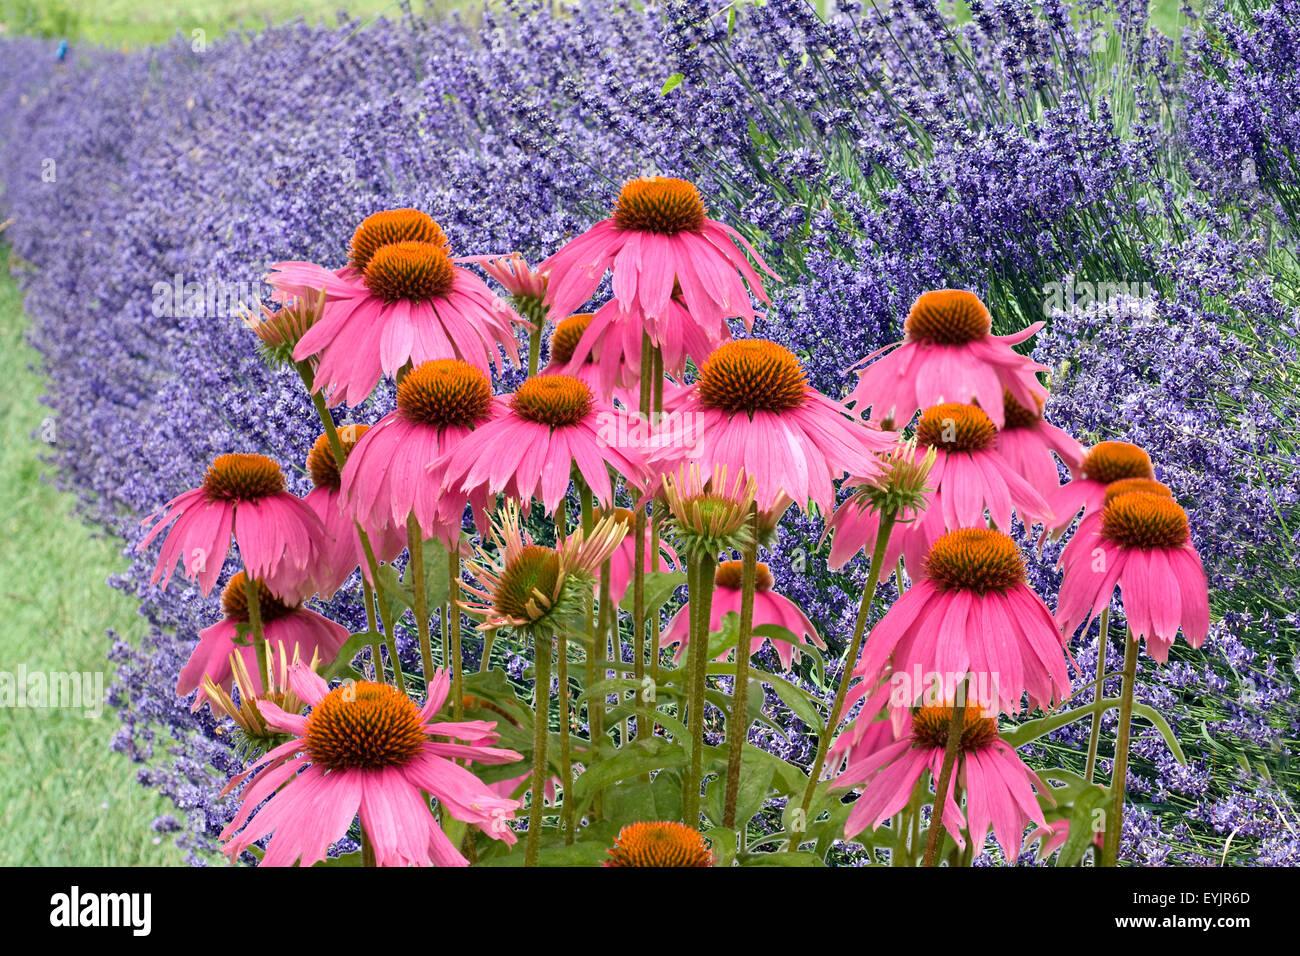 Lavendel; Lavendula; angustifolia; Roter, Sonnenhut - Stock Image